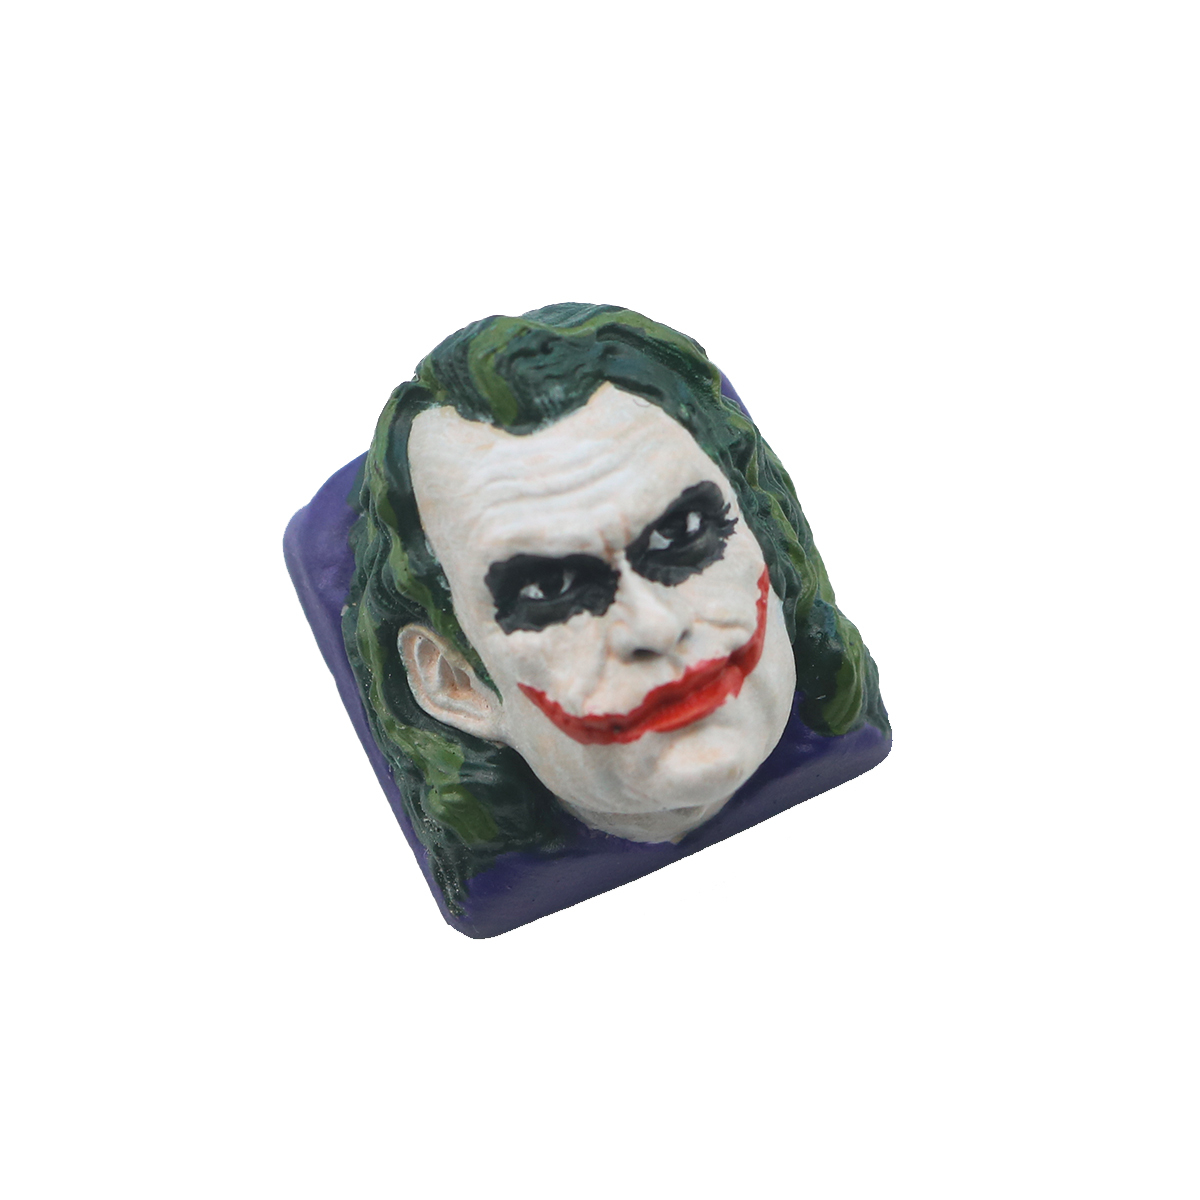 1pc Heath Ledger Joker Manual Resin Keycap For MX Switch Mechanical Keyboard Personality Key Cap For Batman